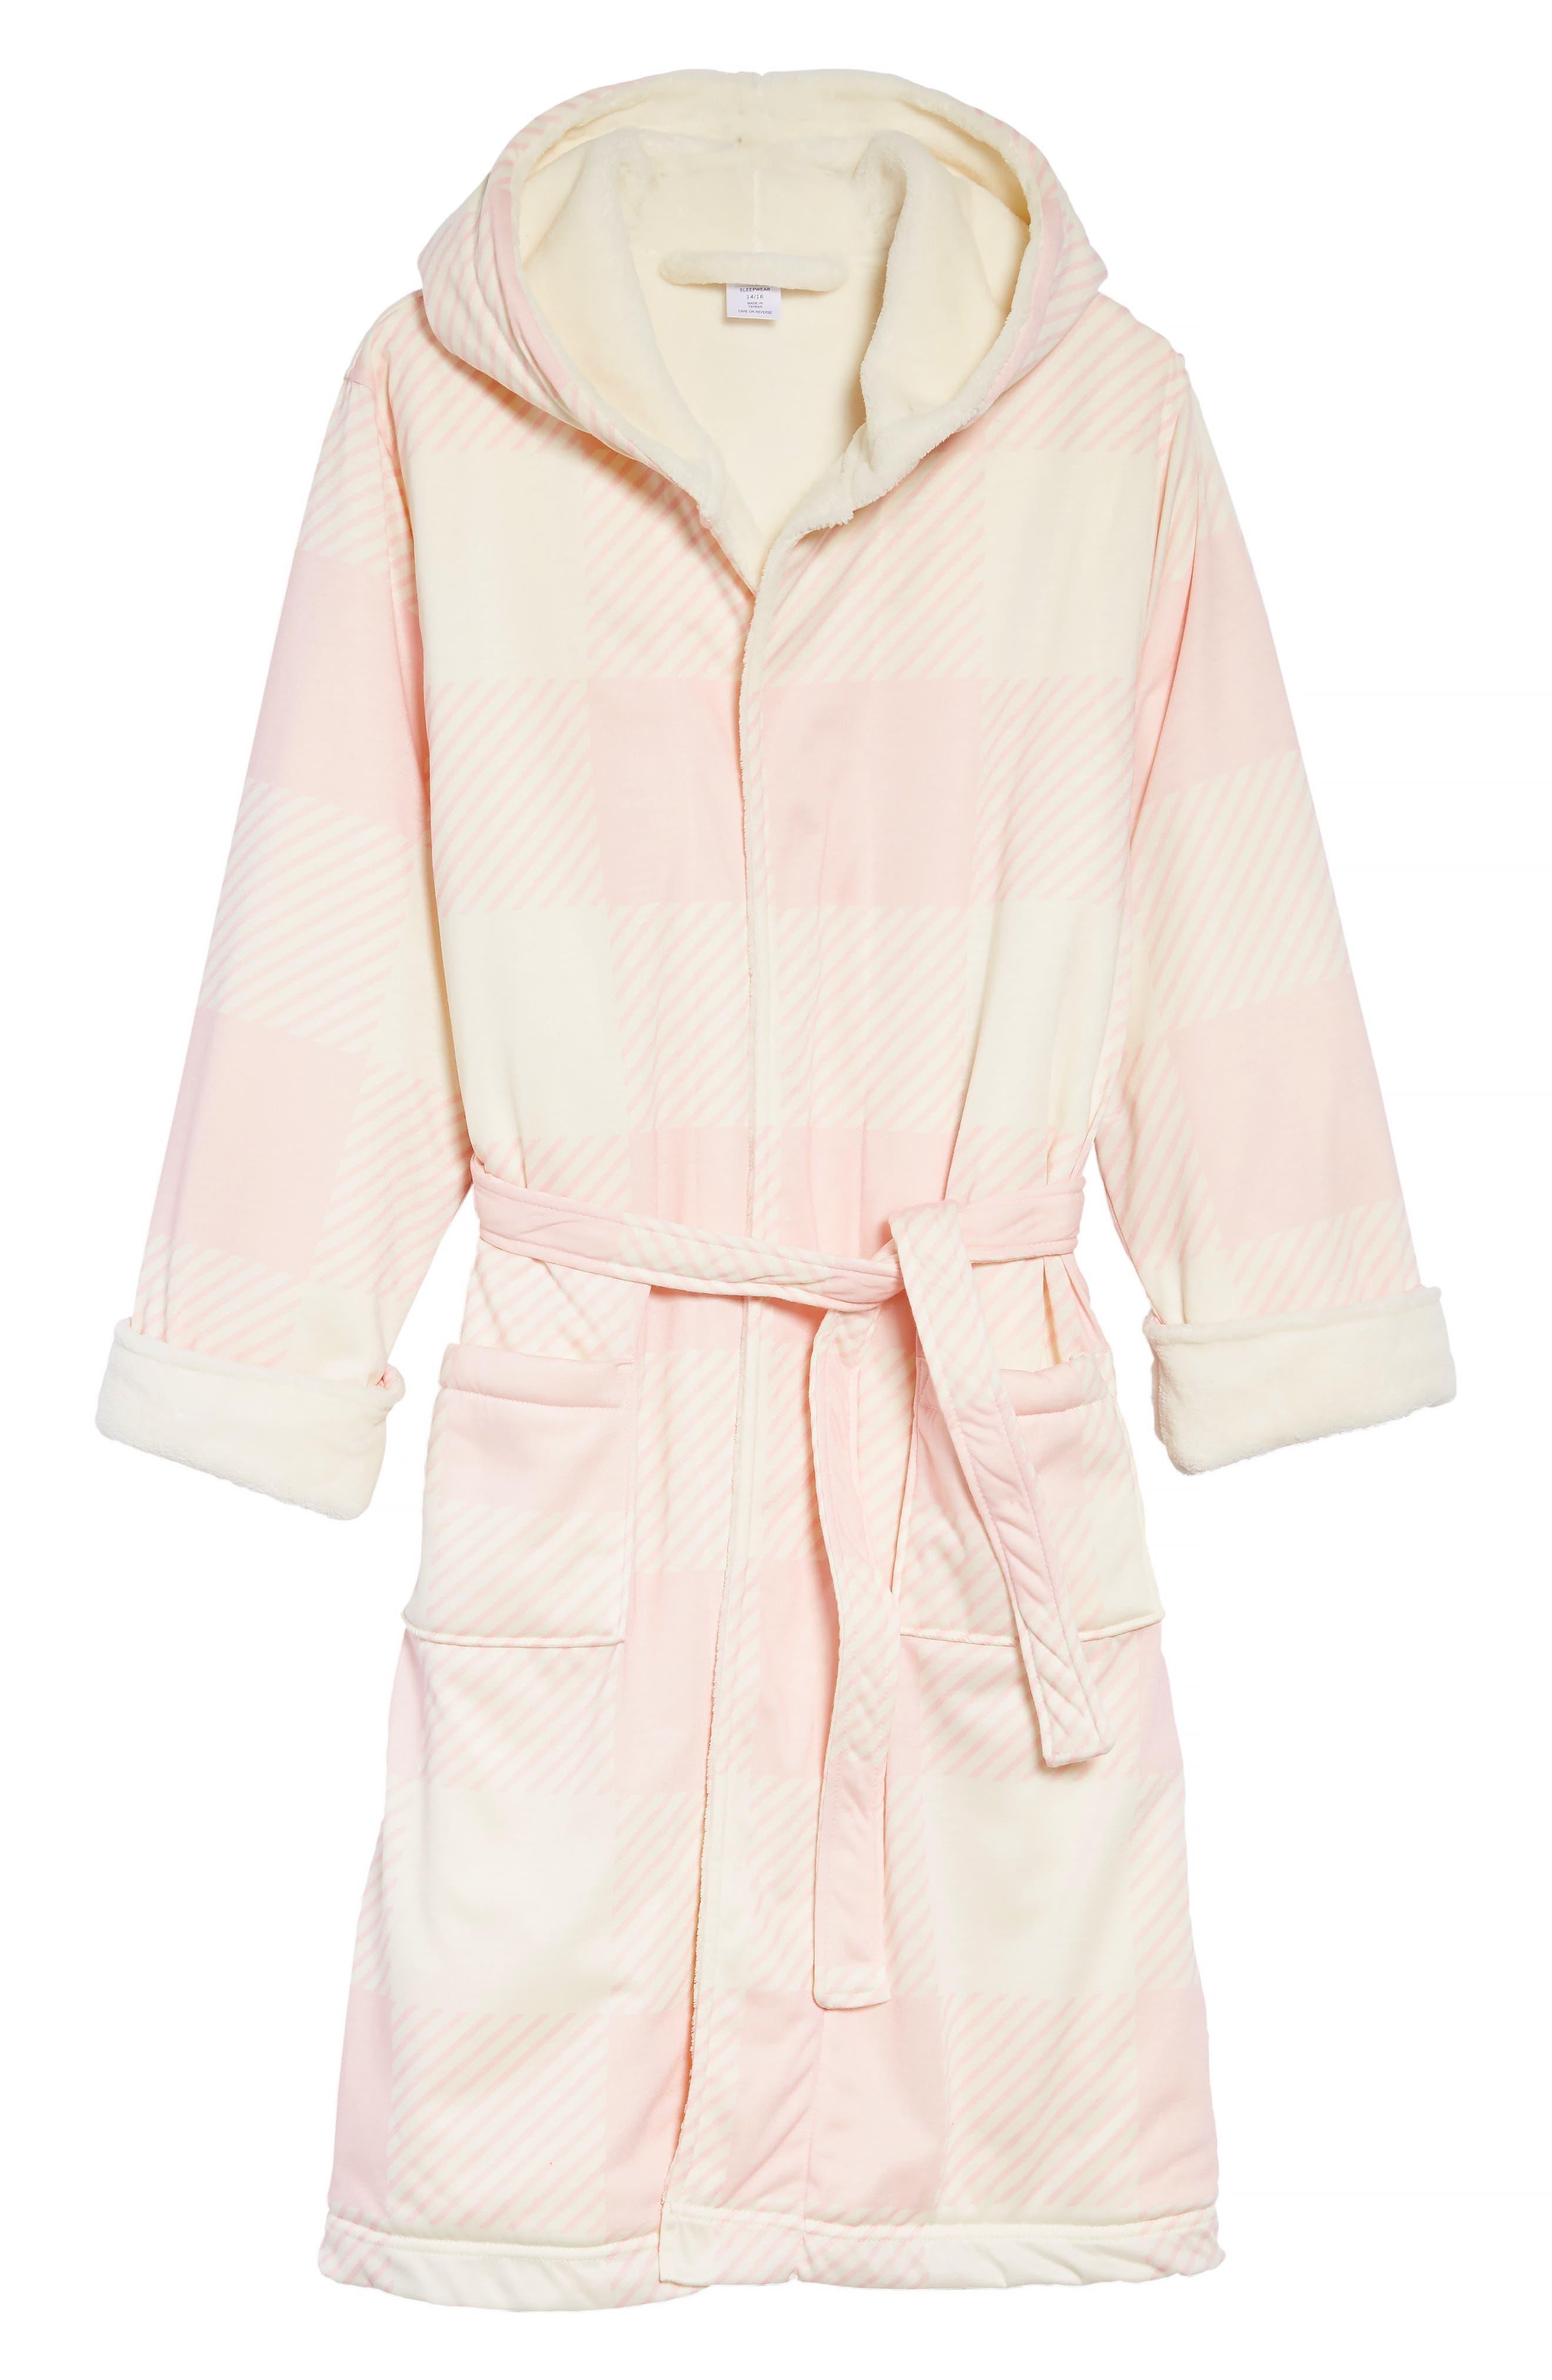 Girls Tucker  Tate Plush Lined Robe Size 1012  Pink